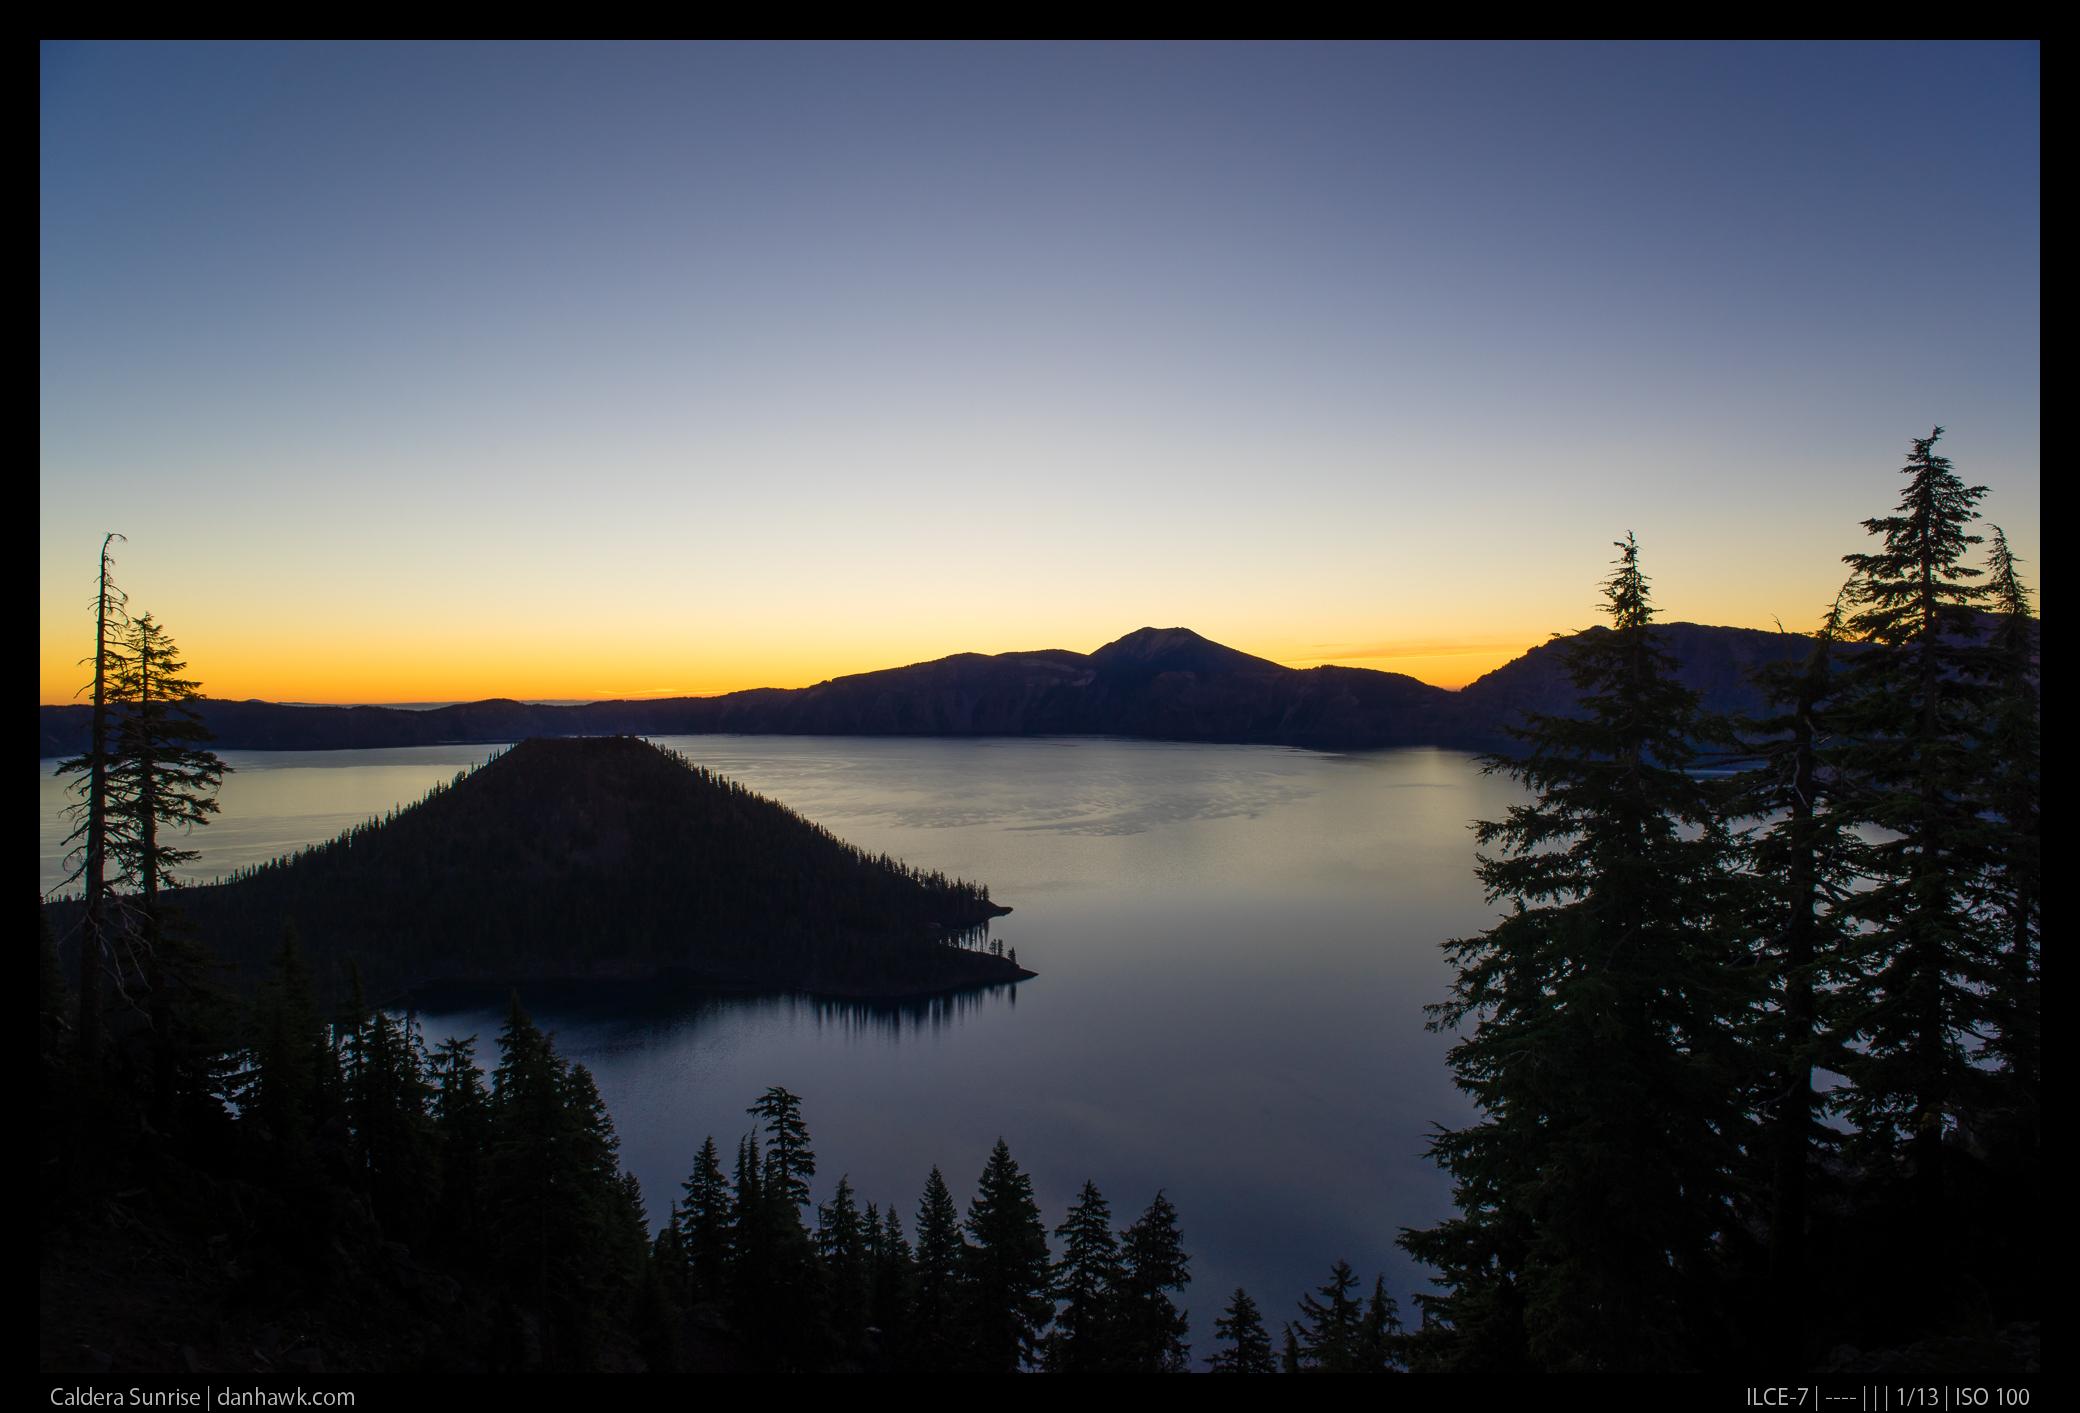 Caldera Sunrise